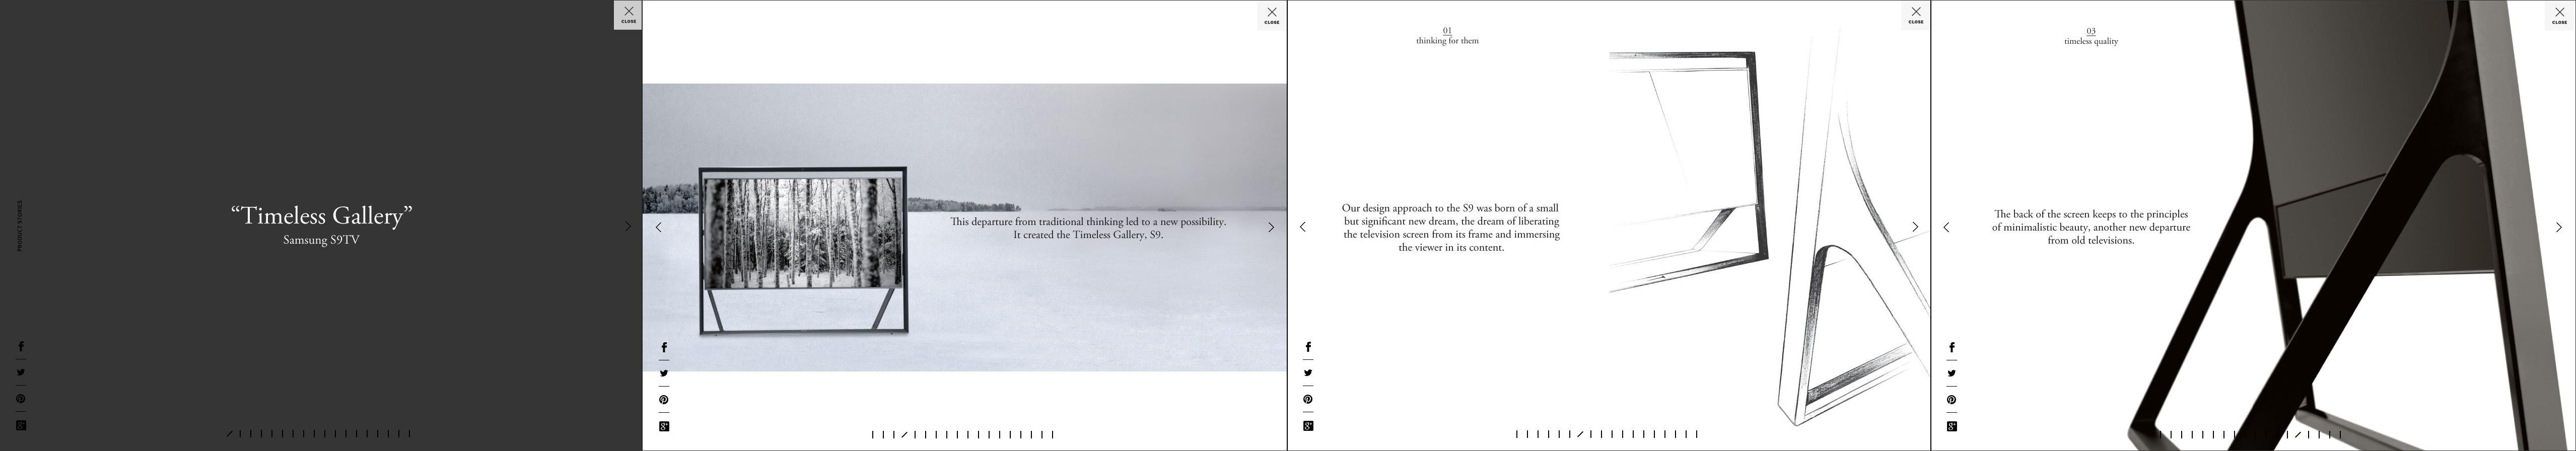 design.samsung.com_product stories-1